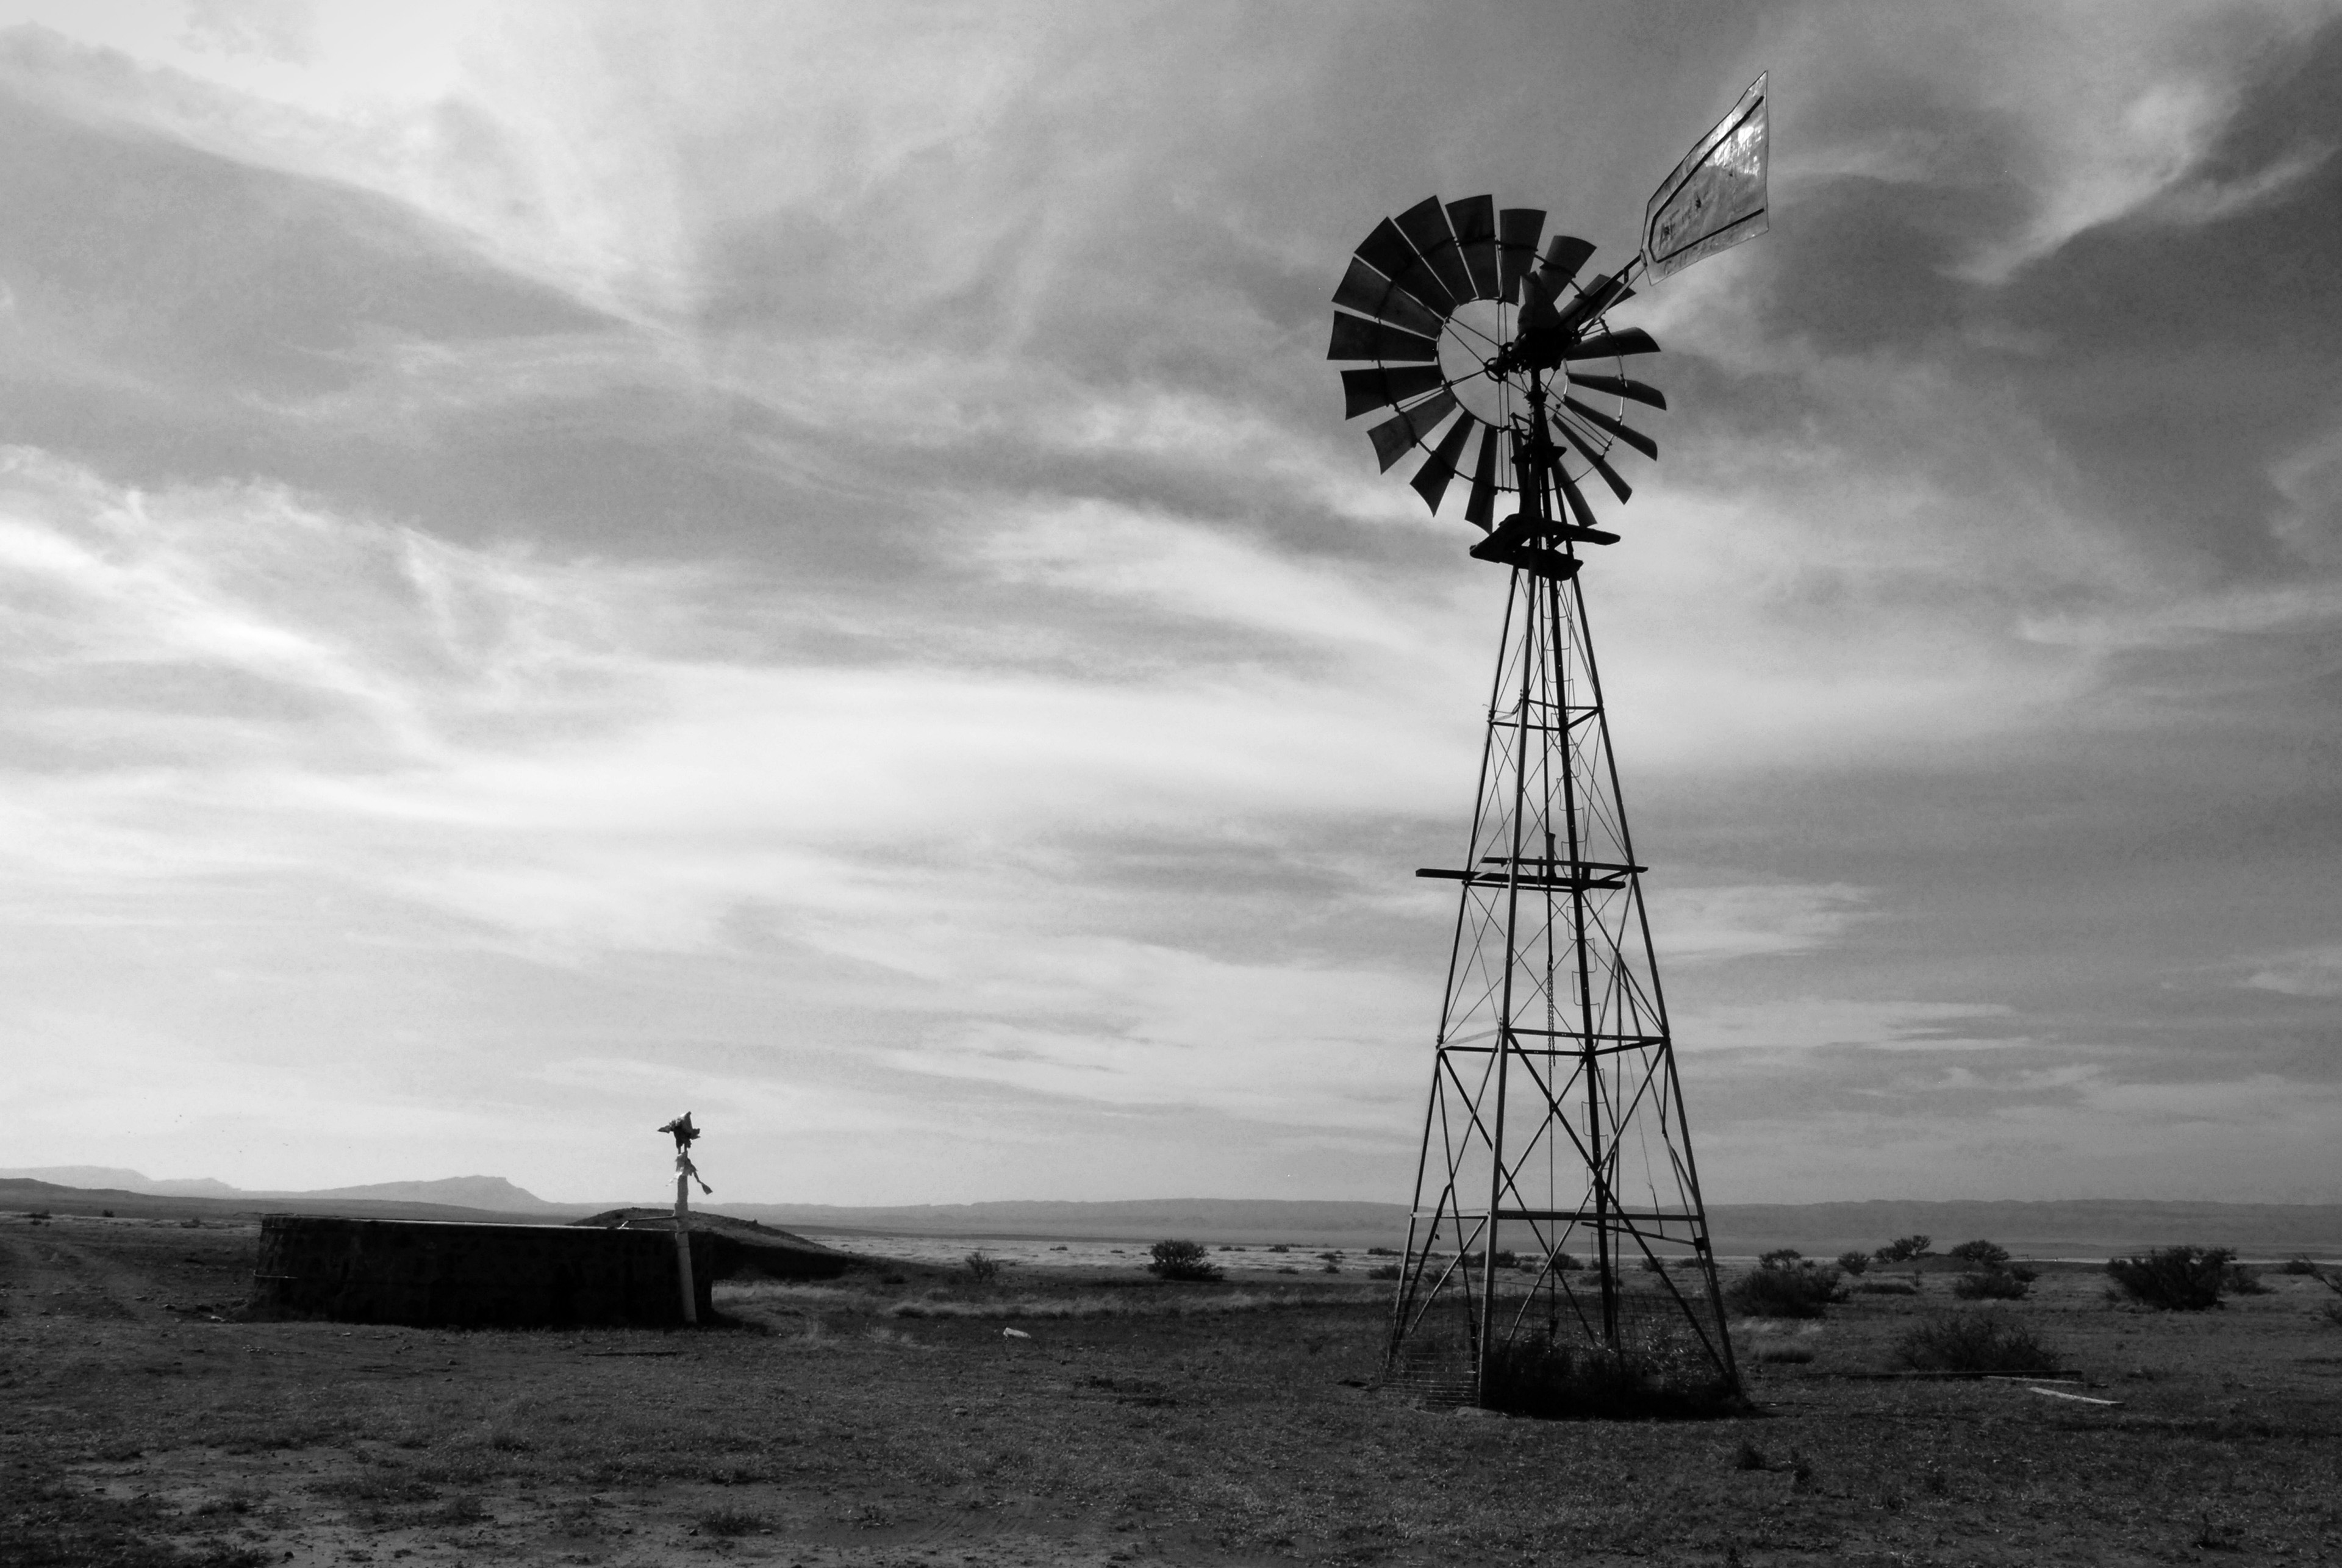 A windmill in a desert landscape